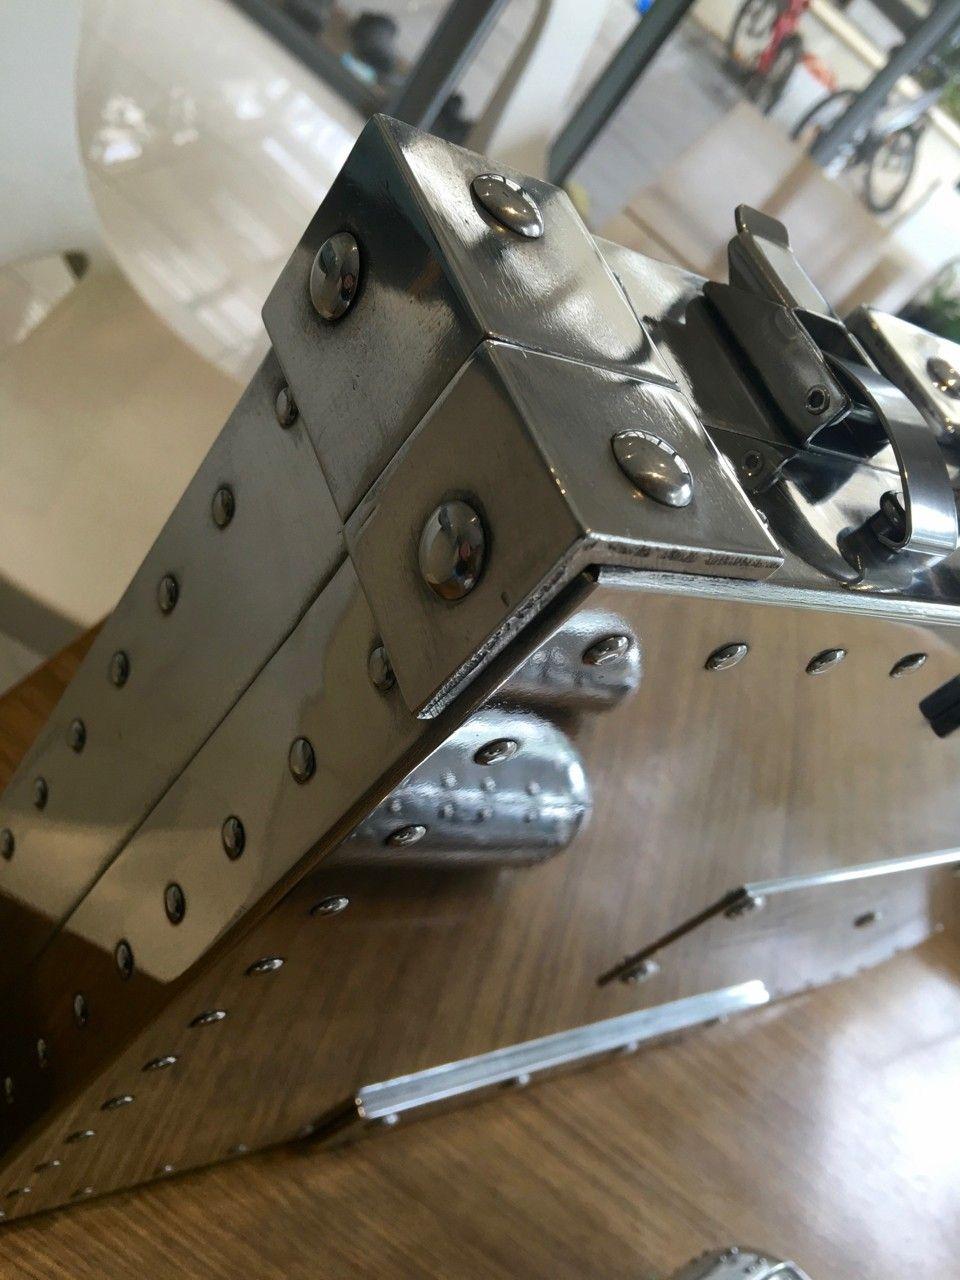 Polished Rep Briefcase & Vaults - Polished Case - 5.jpg